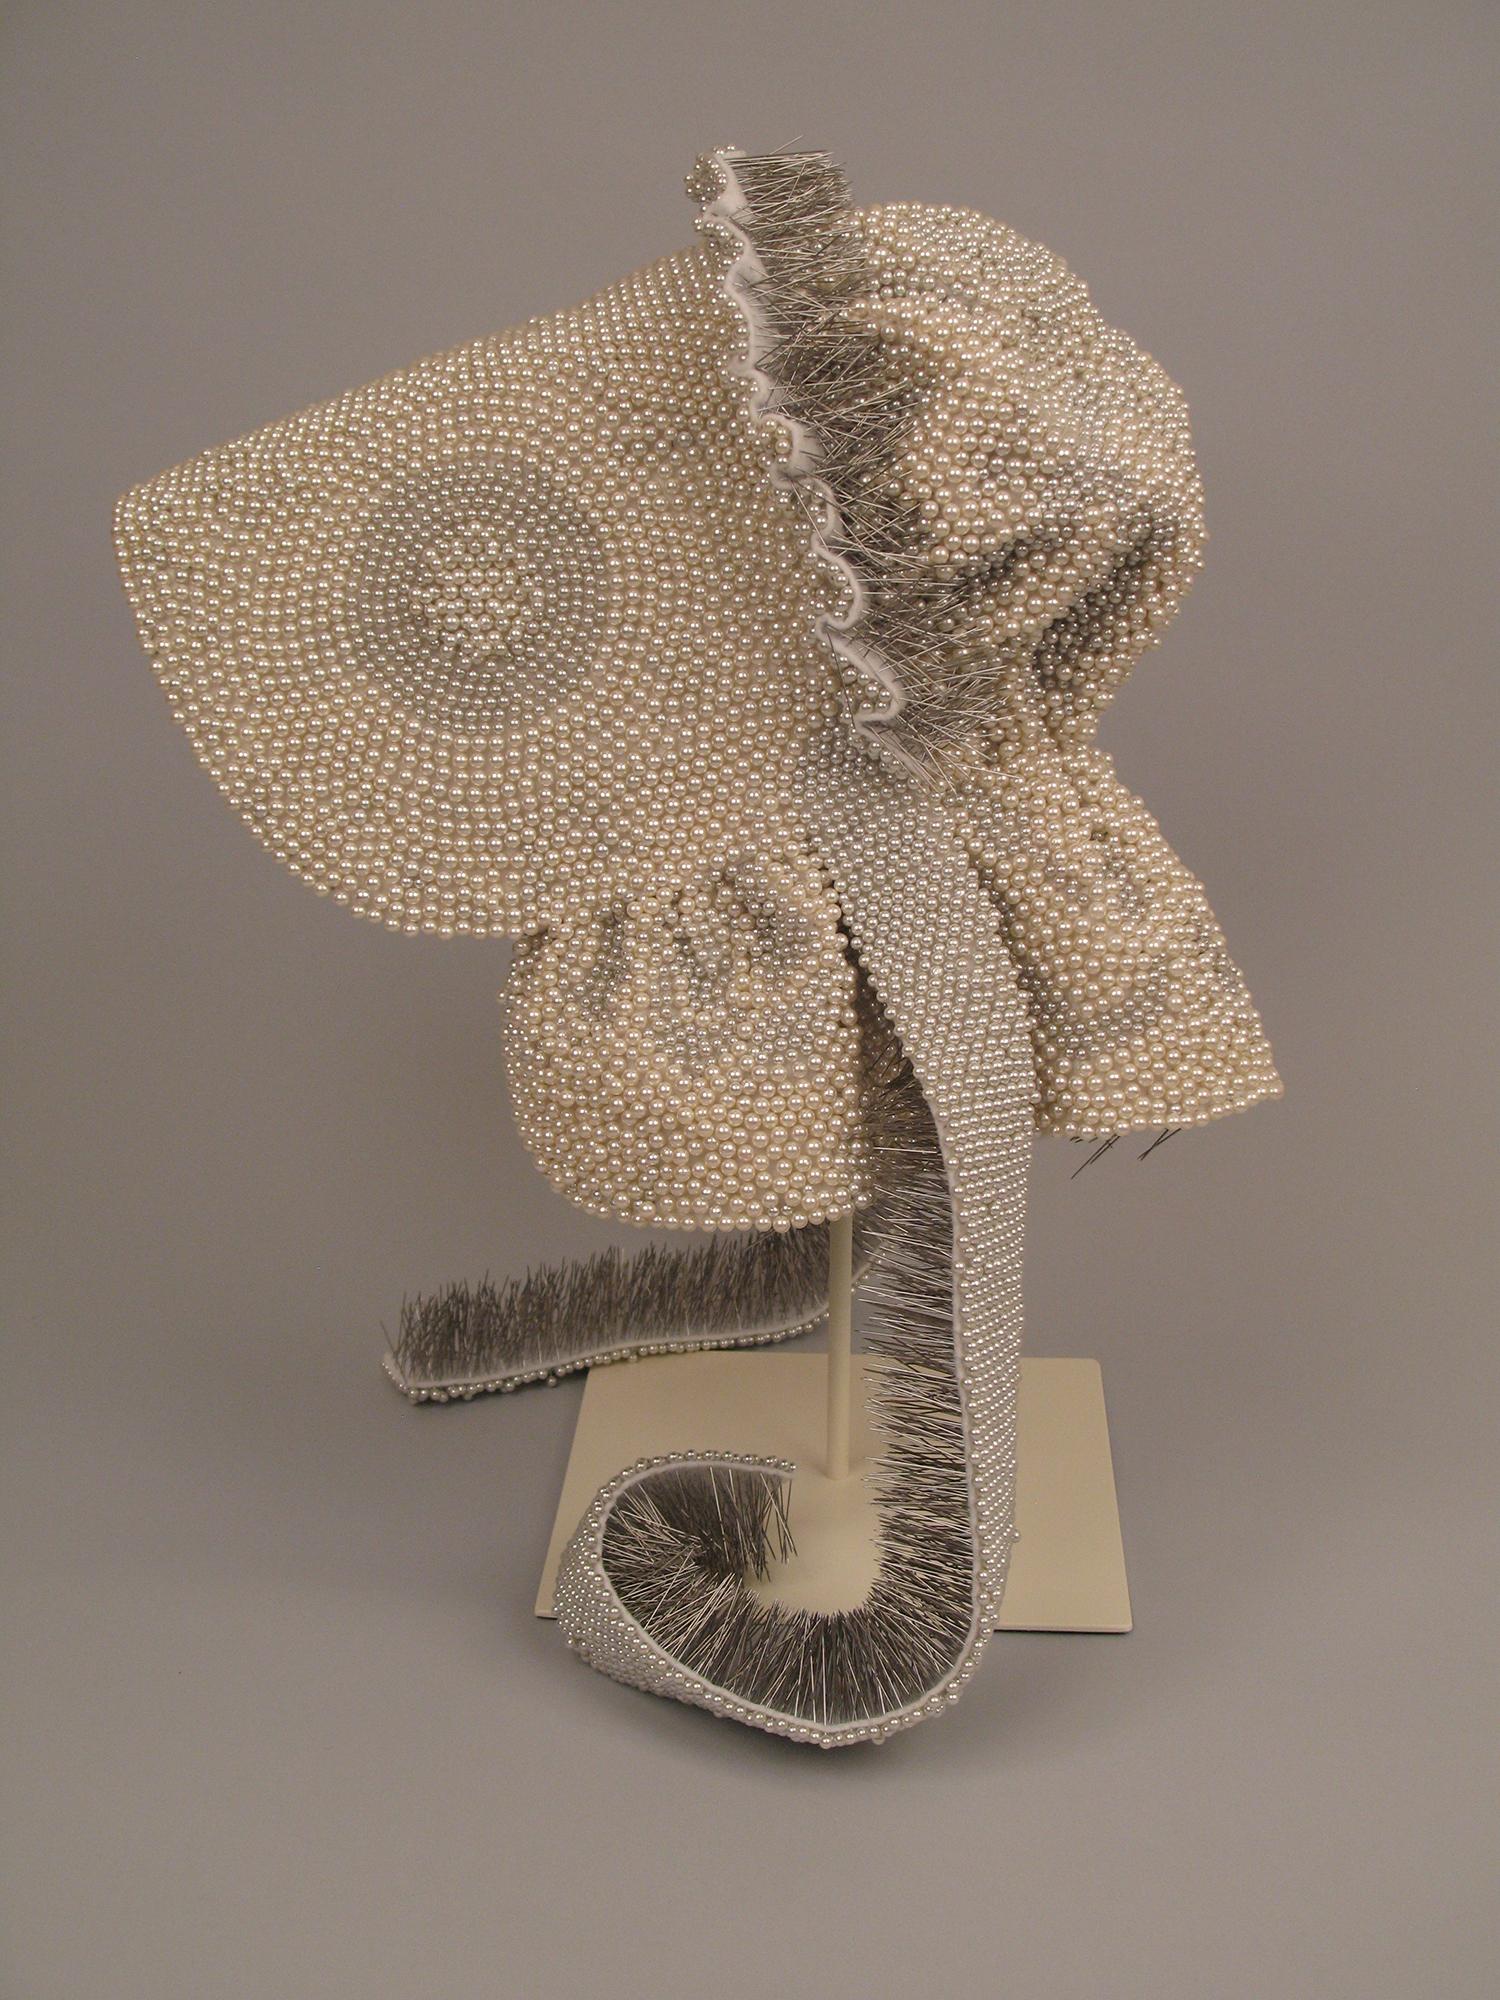 "Seer Bonnet V  14,544 pearl corsage pins, fabric, 19"" x 11"" x 13"", 2009"